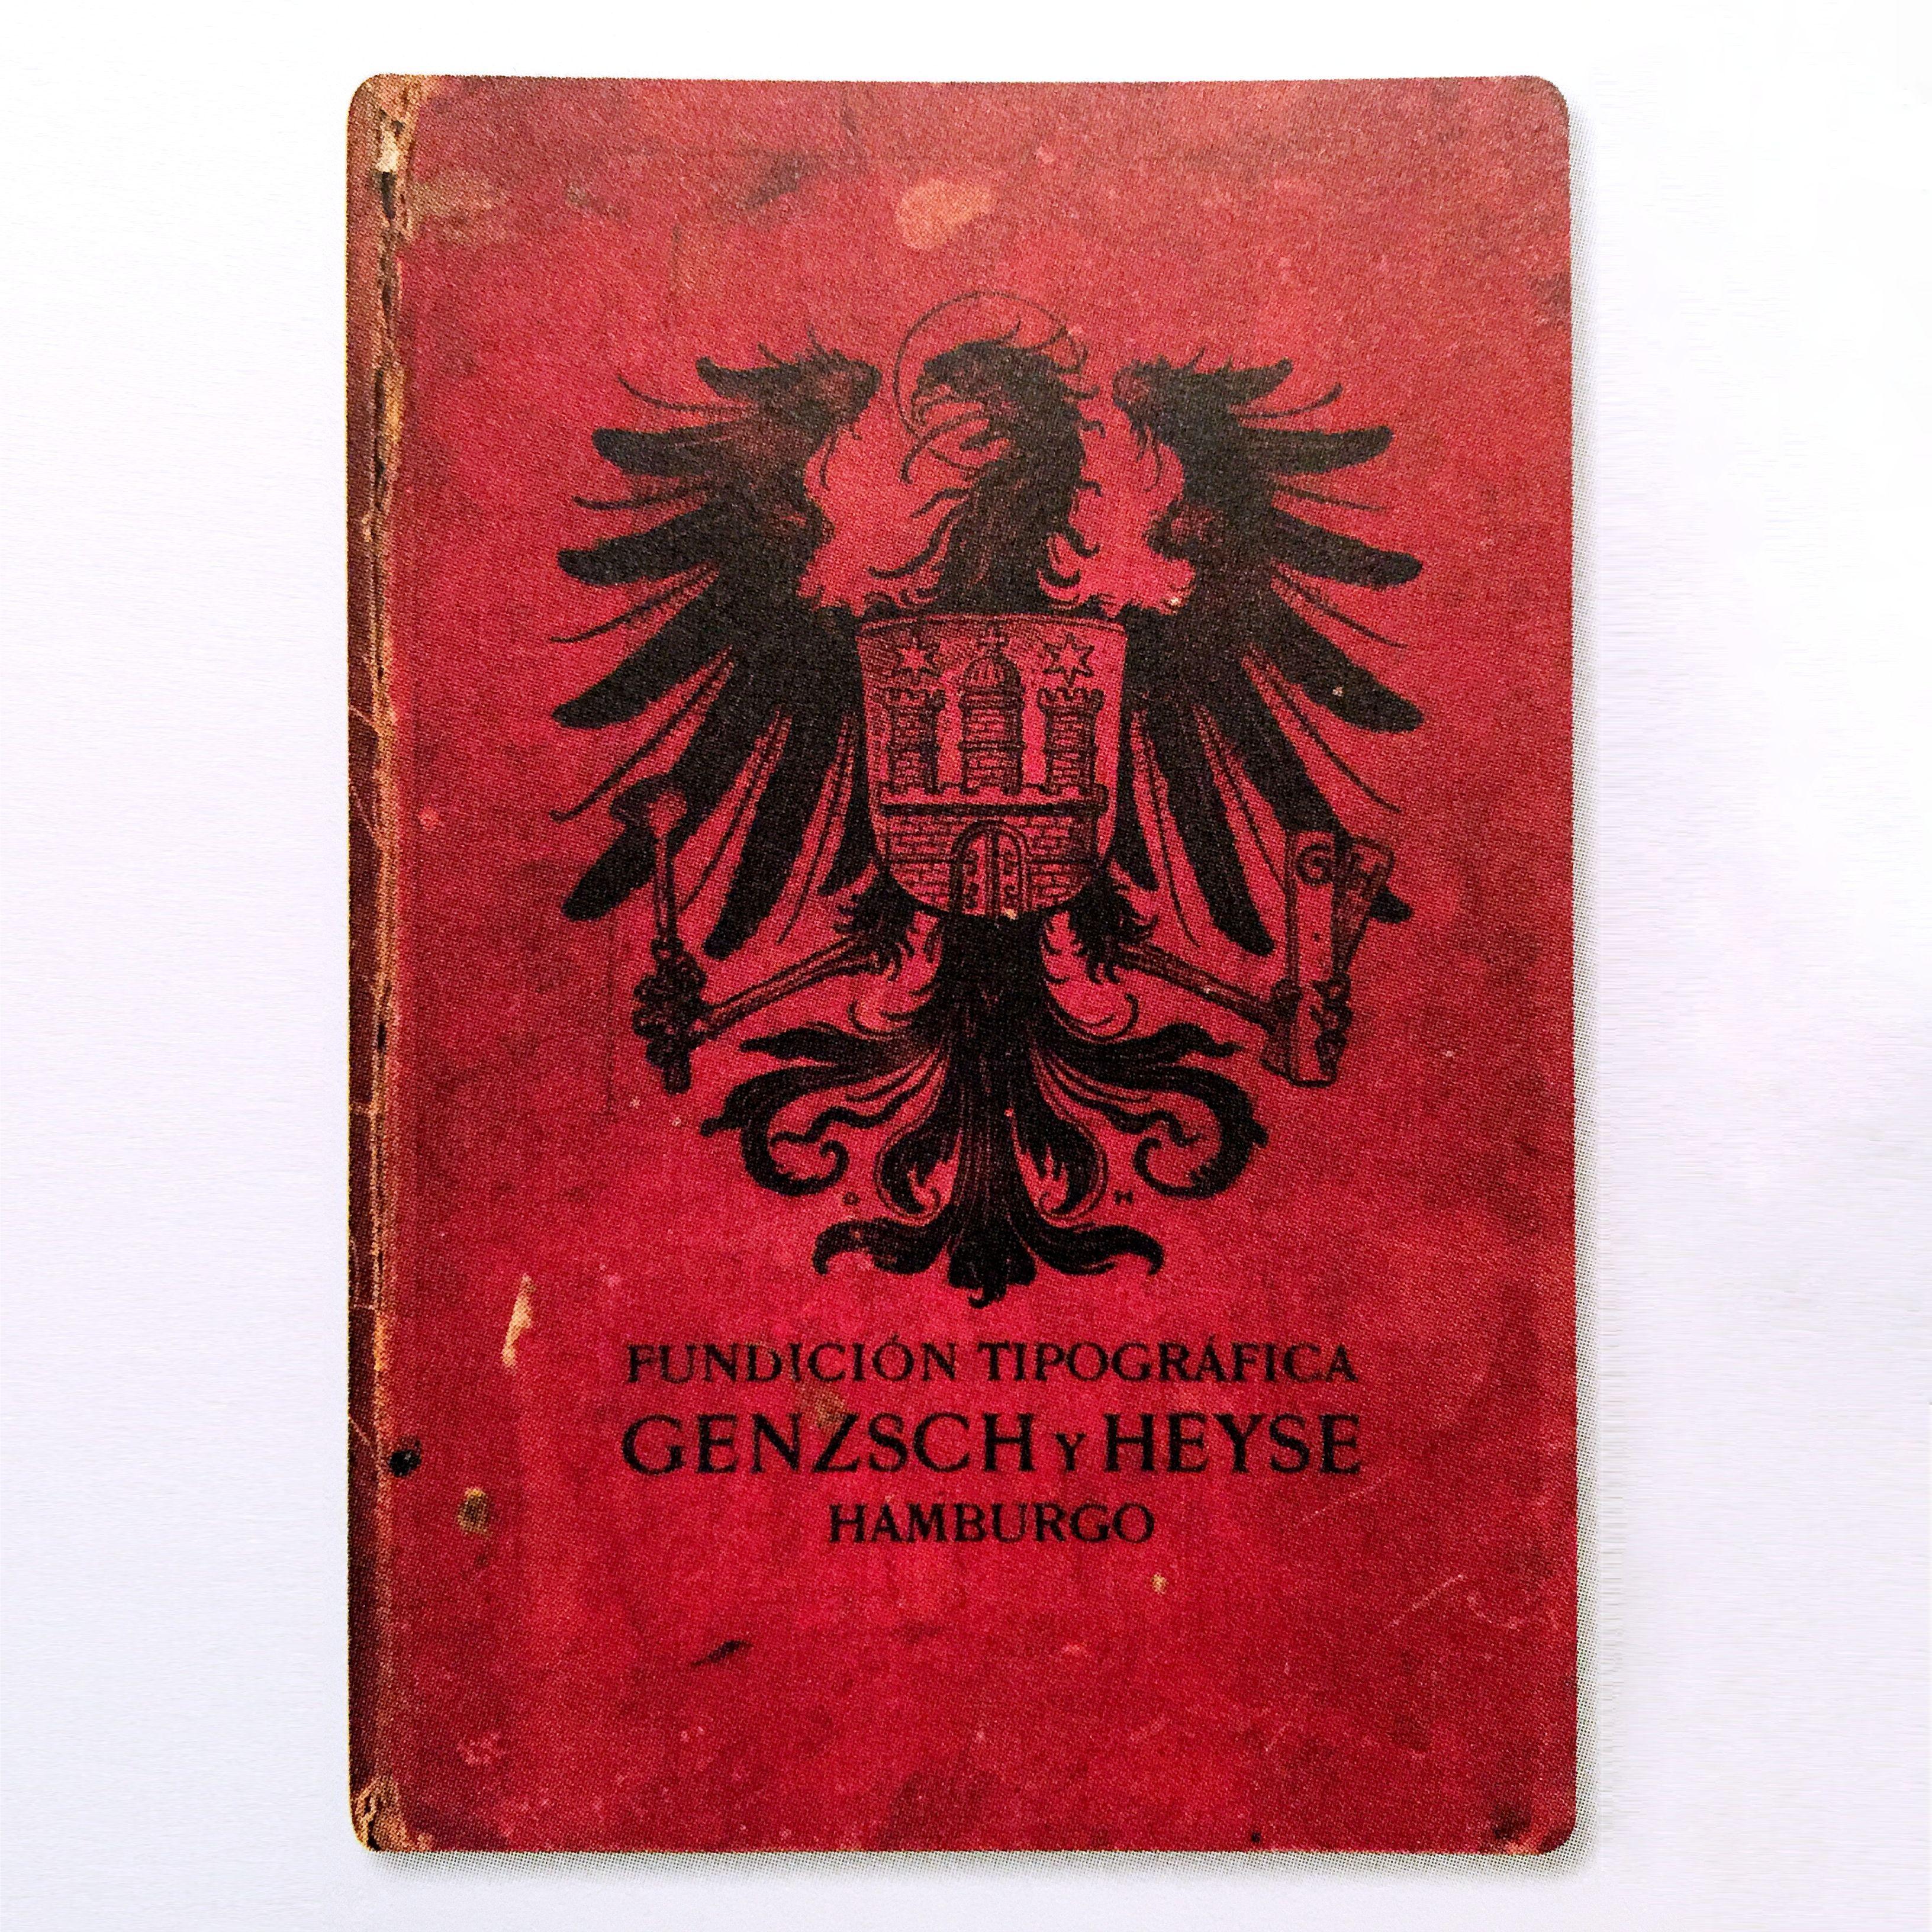 Genzsch Heyse 1903 Hamburg Children Book Cover Cursed Child Book Book Cover